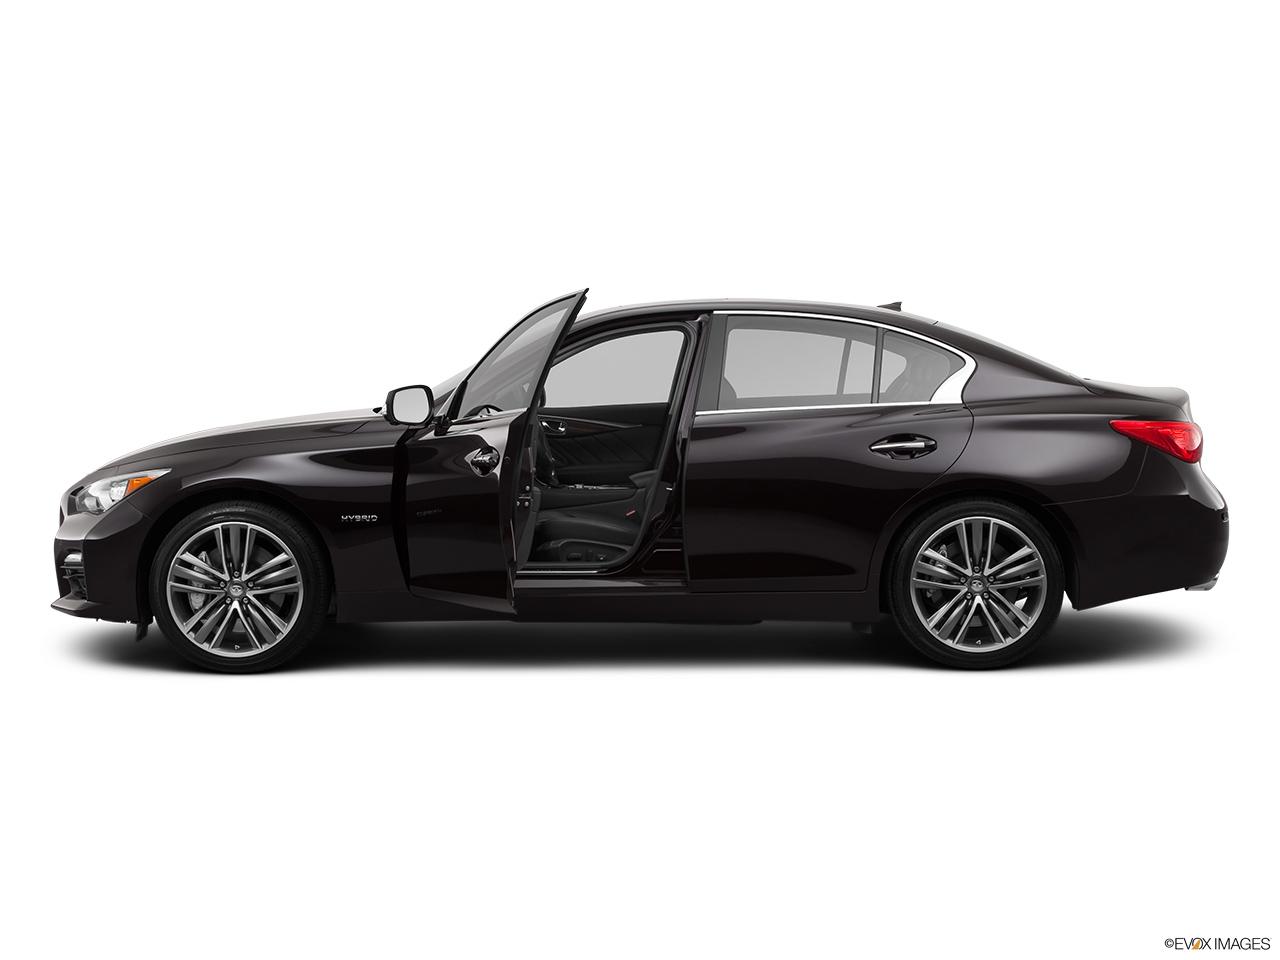 2014 Infiniti Q50 Sedan Rwd Hybrid Sport Driver S Side